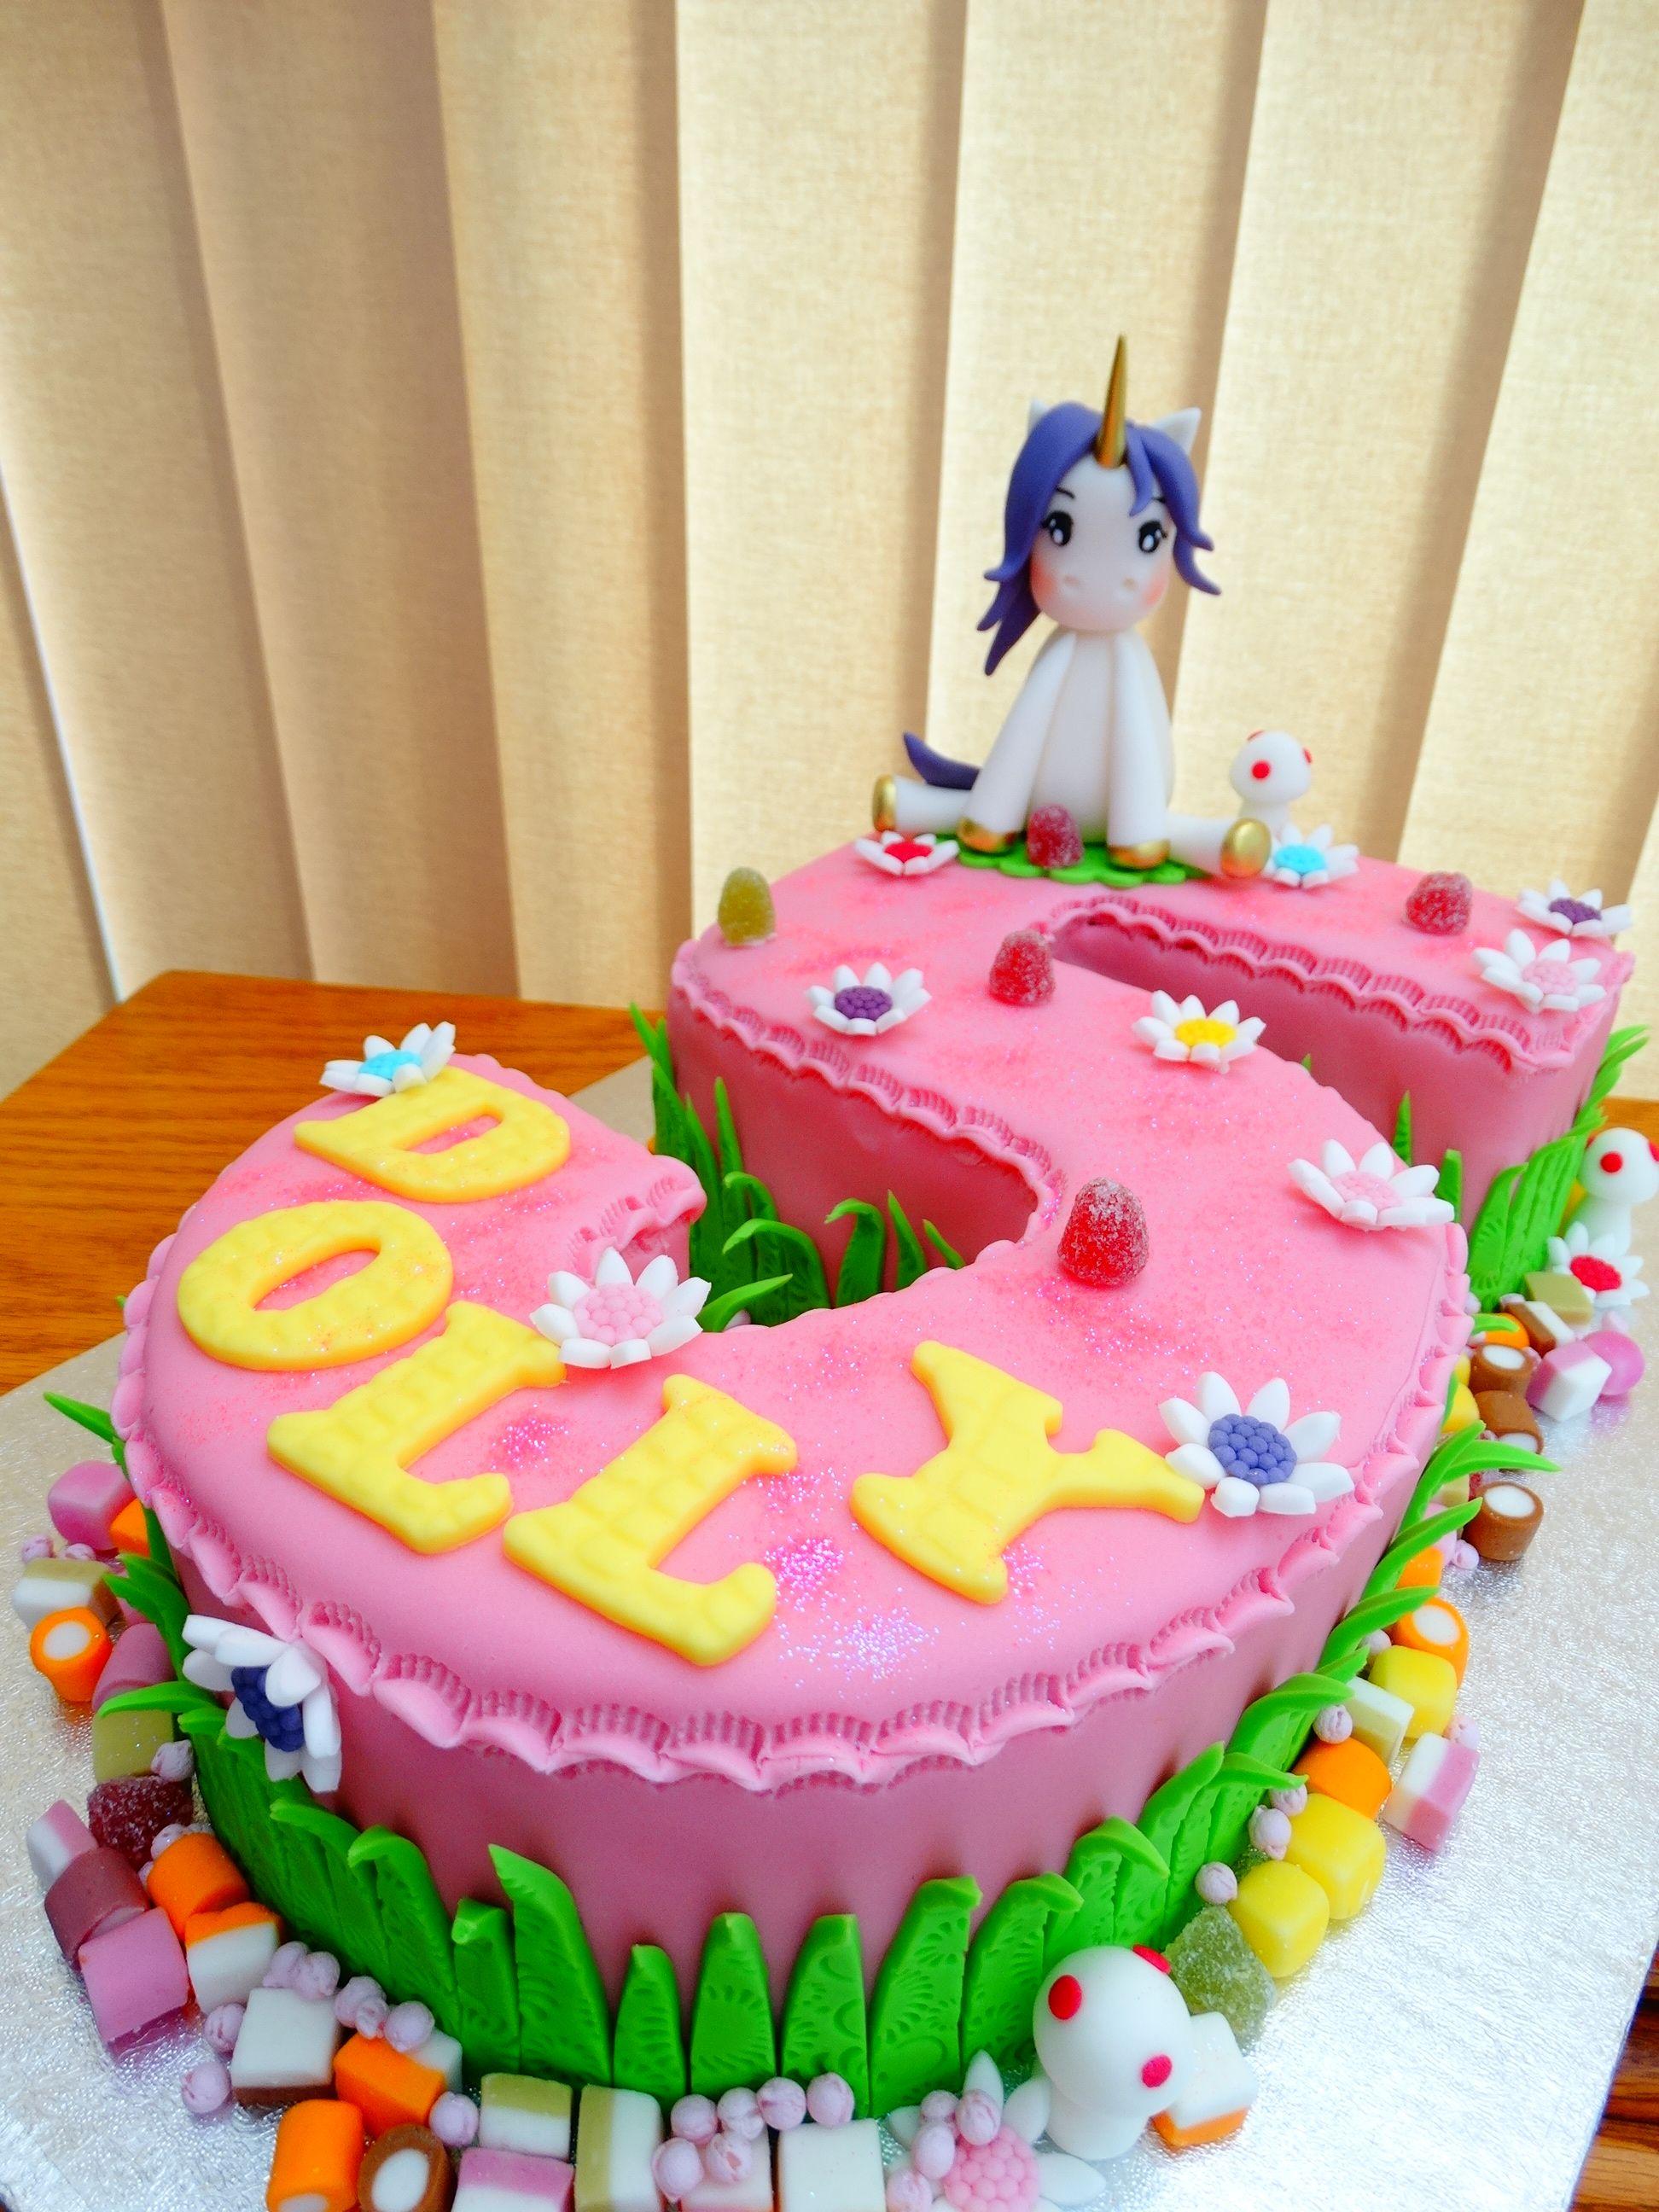 Superb Number 5 Unicorn Cake Xmcx Number 5 Cake Kids Birthday Unicorn Funny Birthday Cards Online Bapapcheapnameinfo